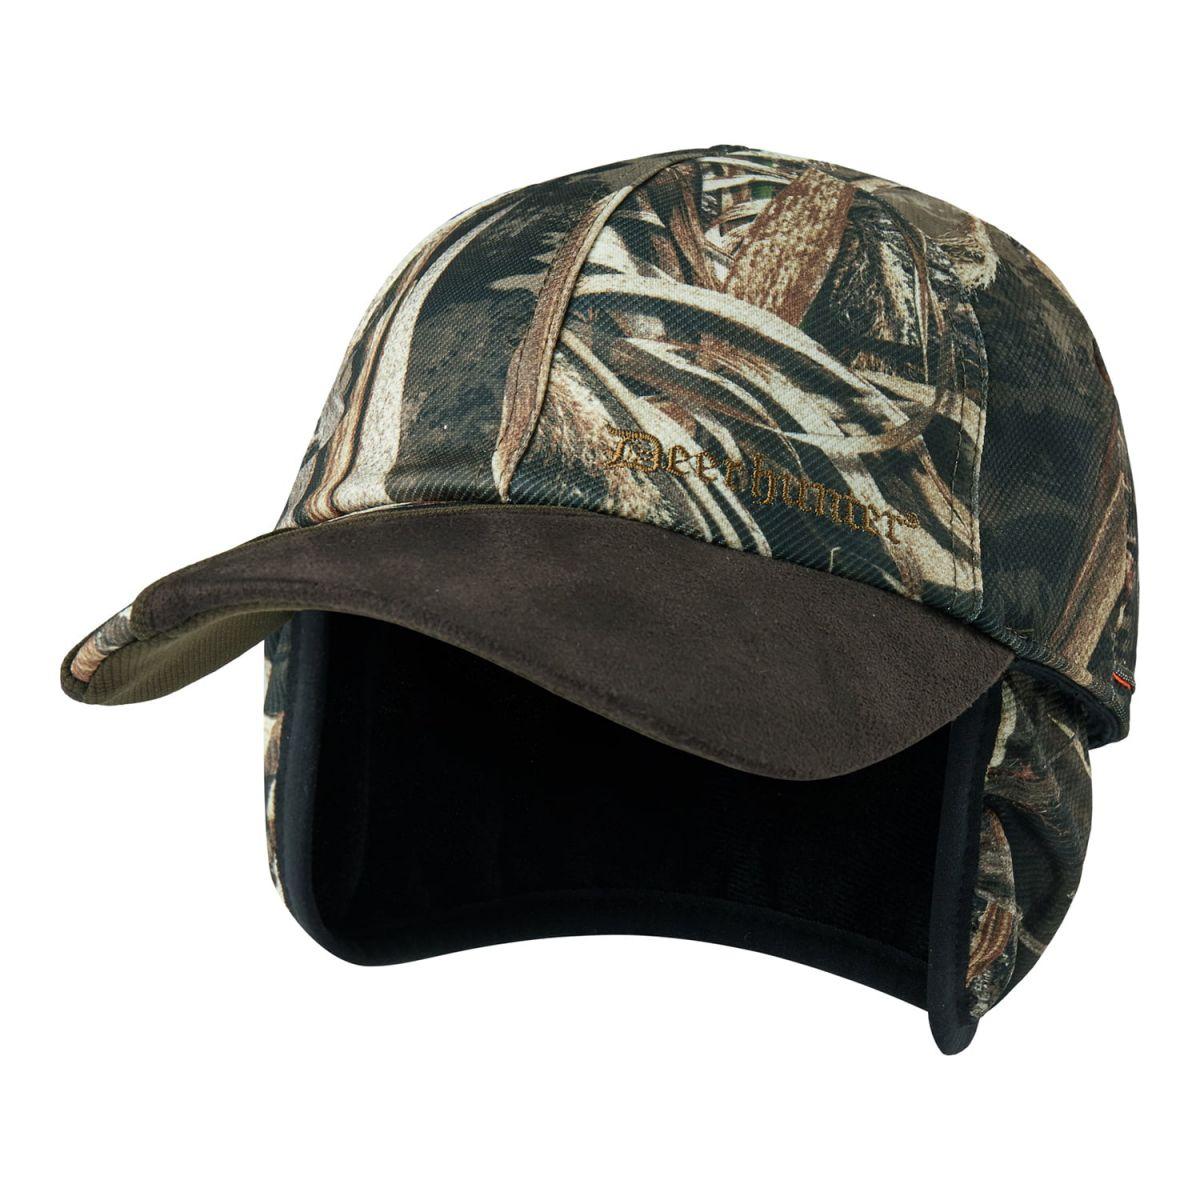 Keпка Deerhunter Muflon Cap Safety Max-5